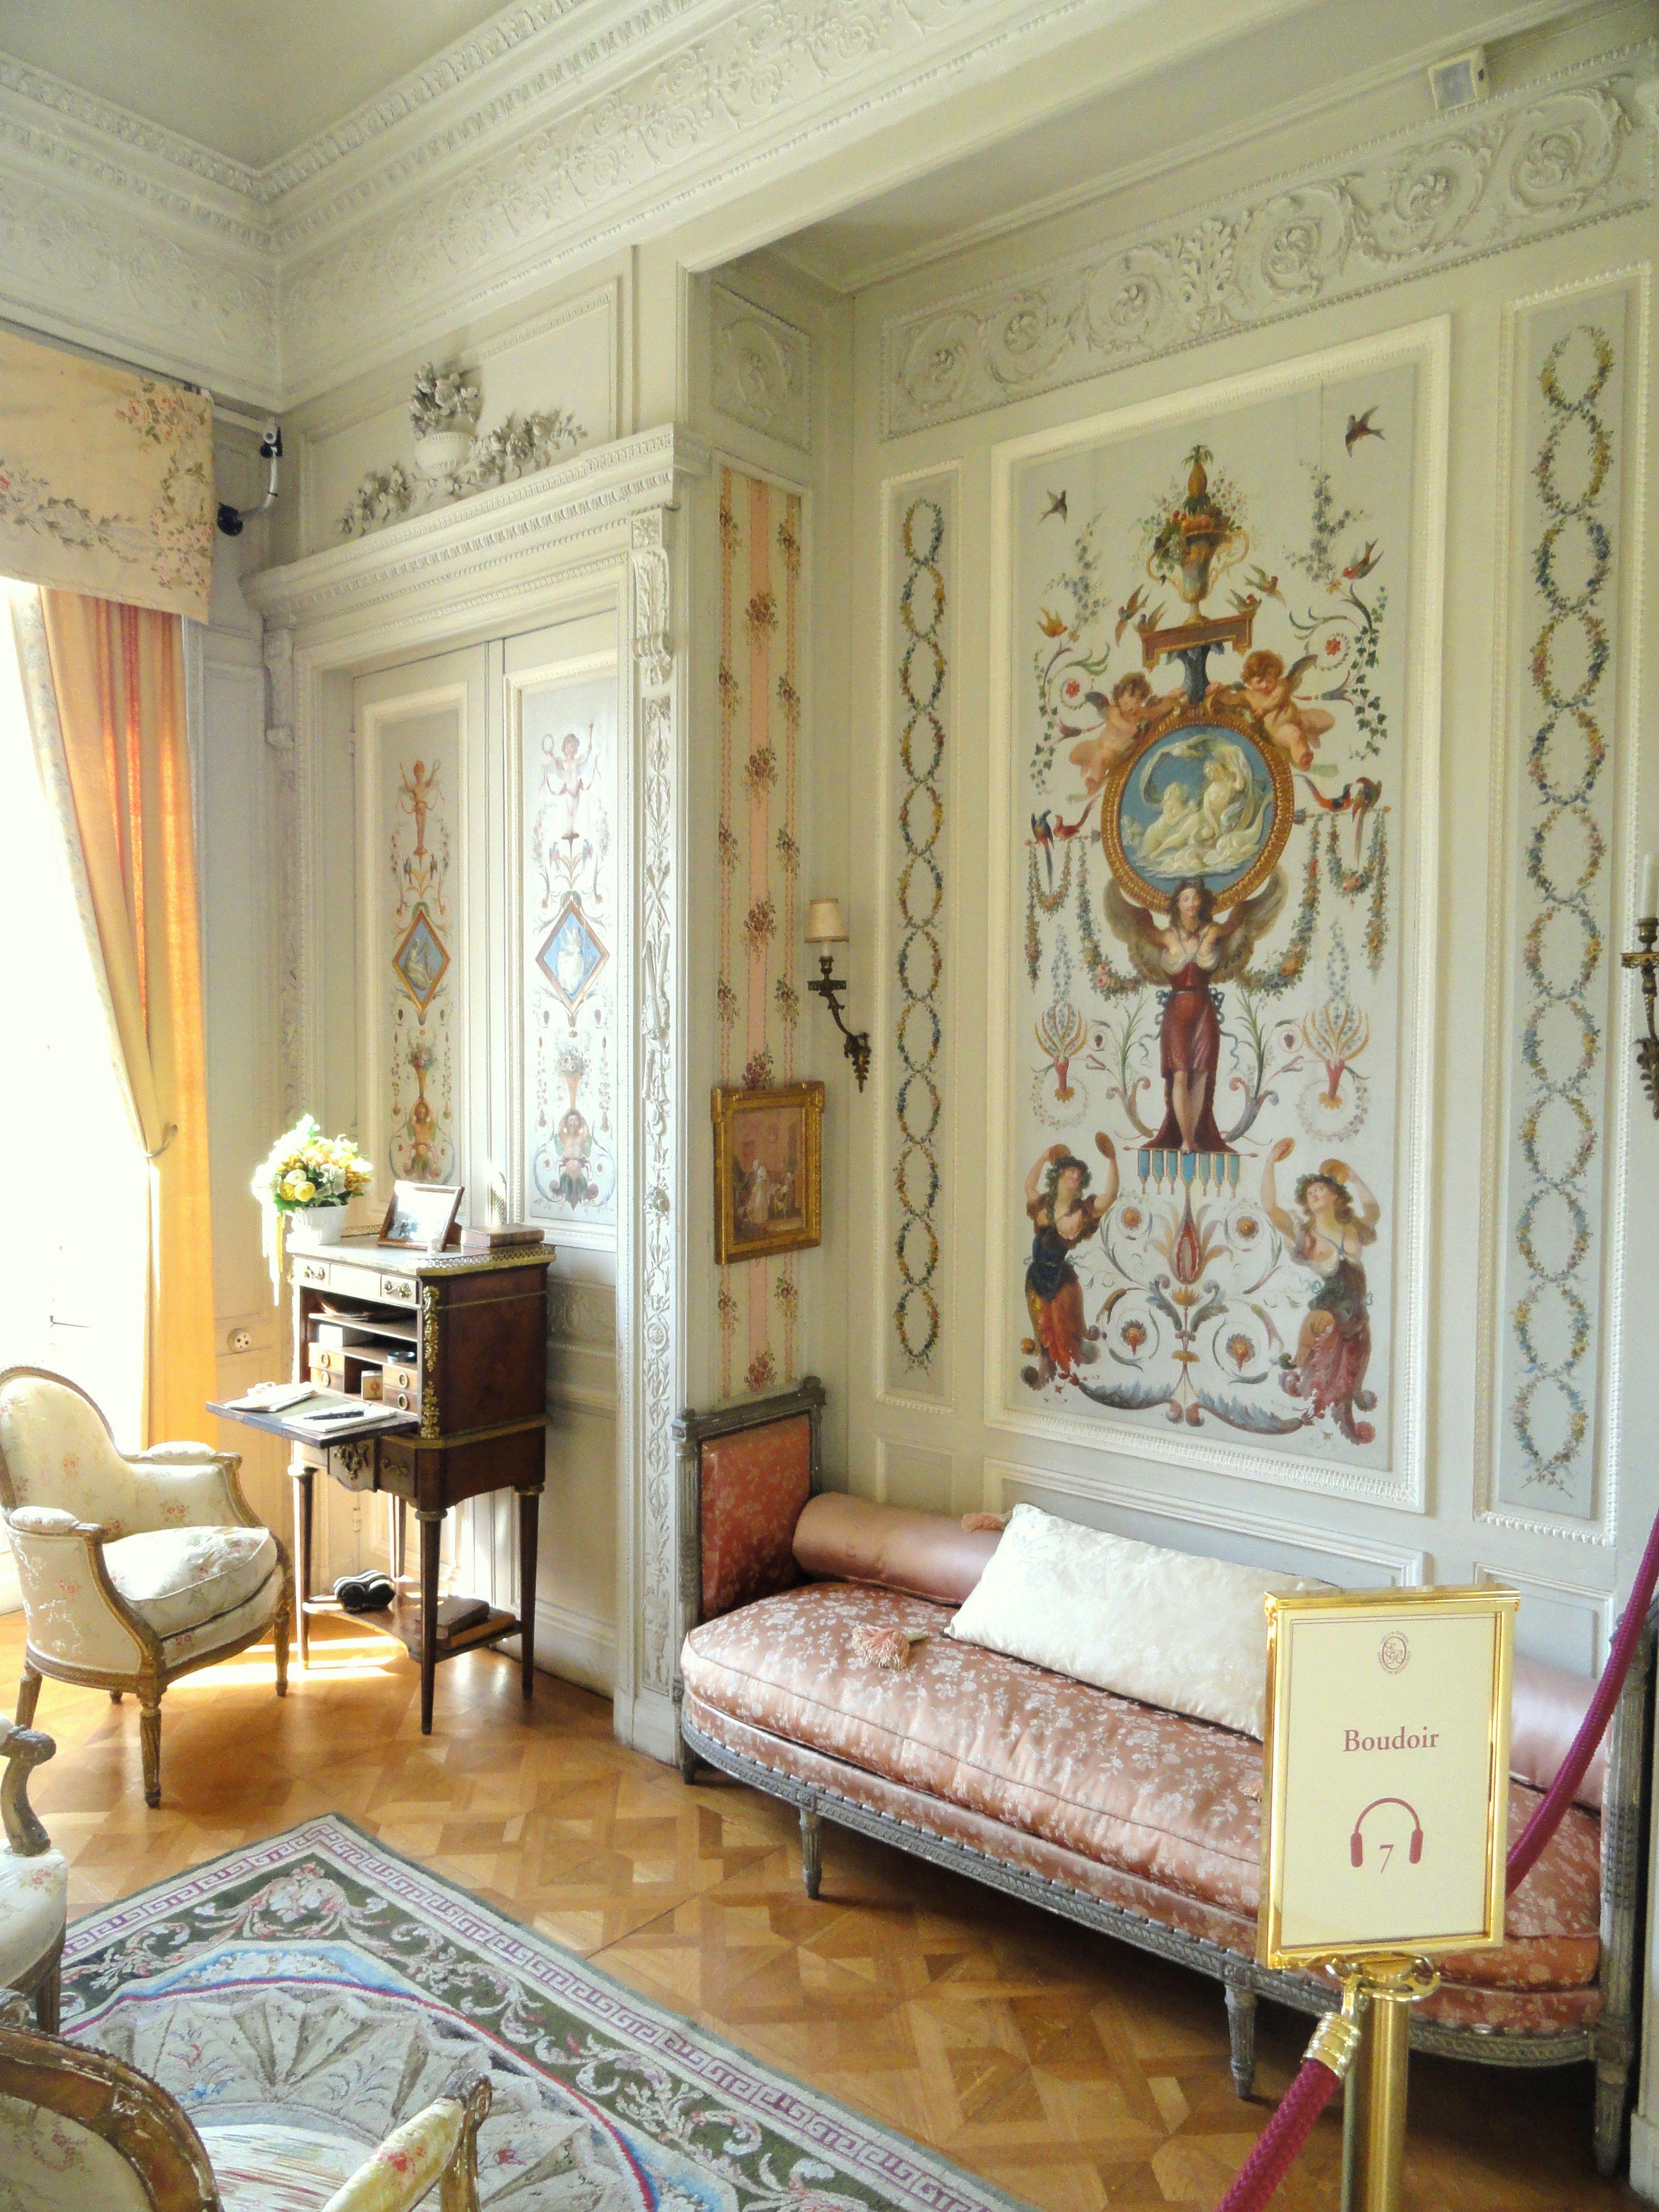 Villa ephrussi de rothschild a wonderful museum and for Interni case francesi